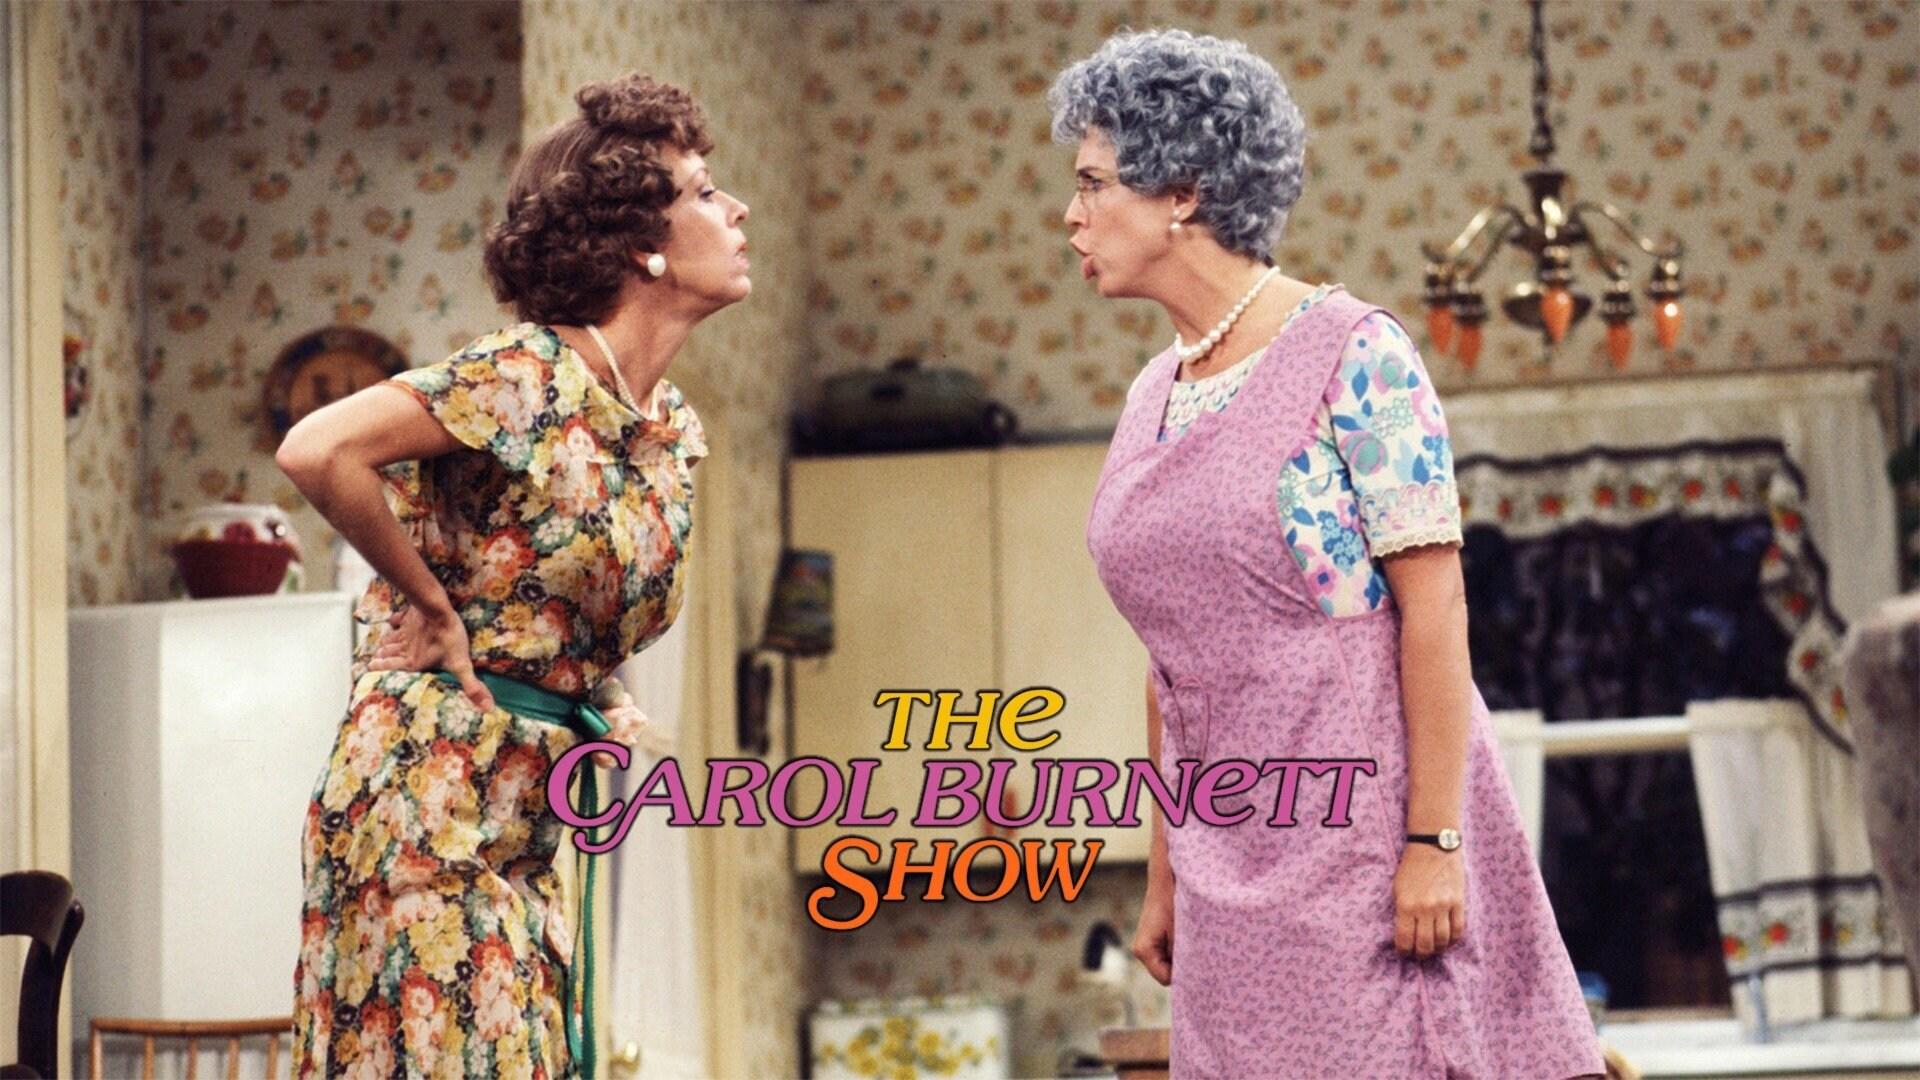 The Carol Burnett Show: Martha Raye, Tim Conway